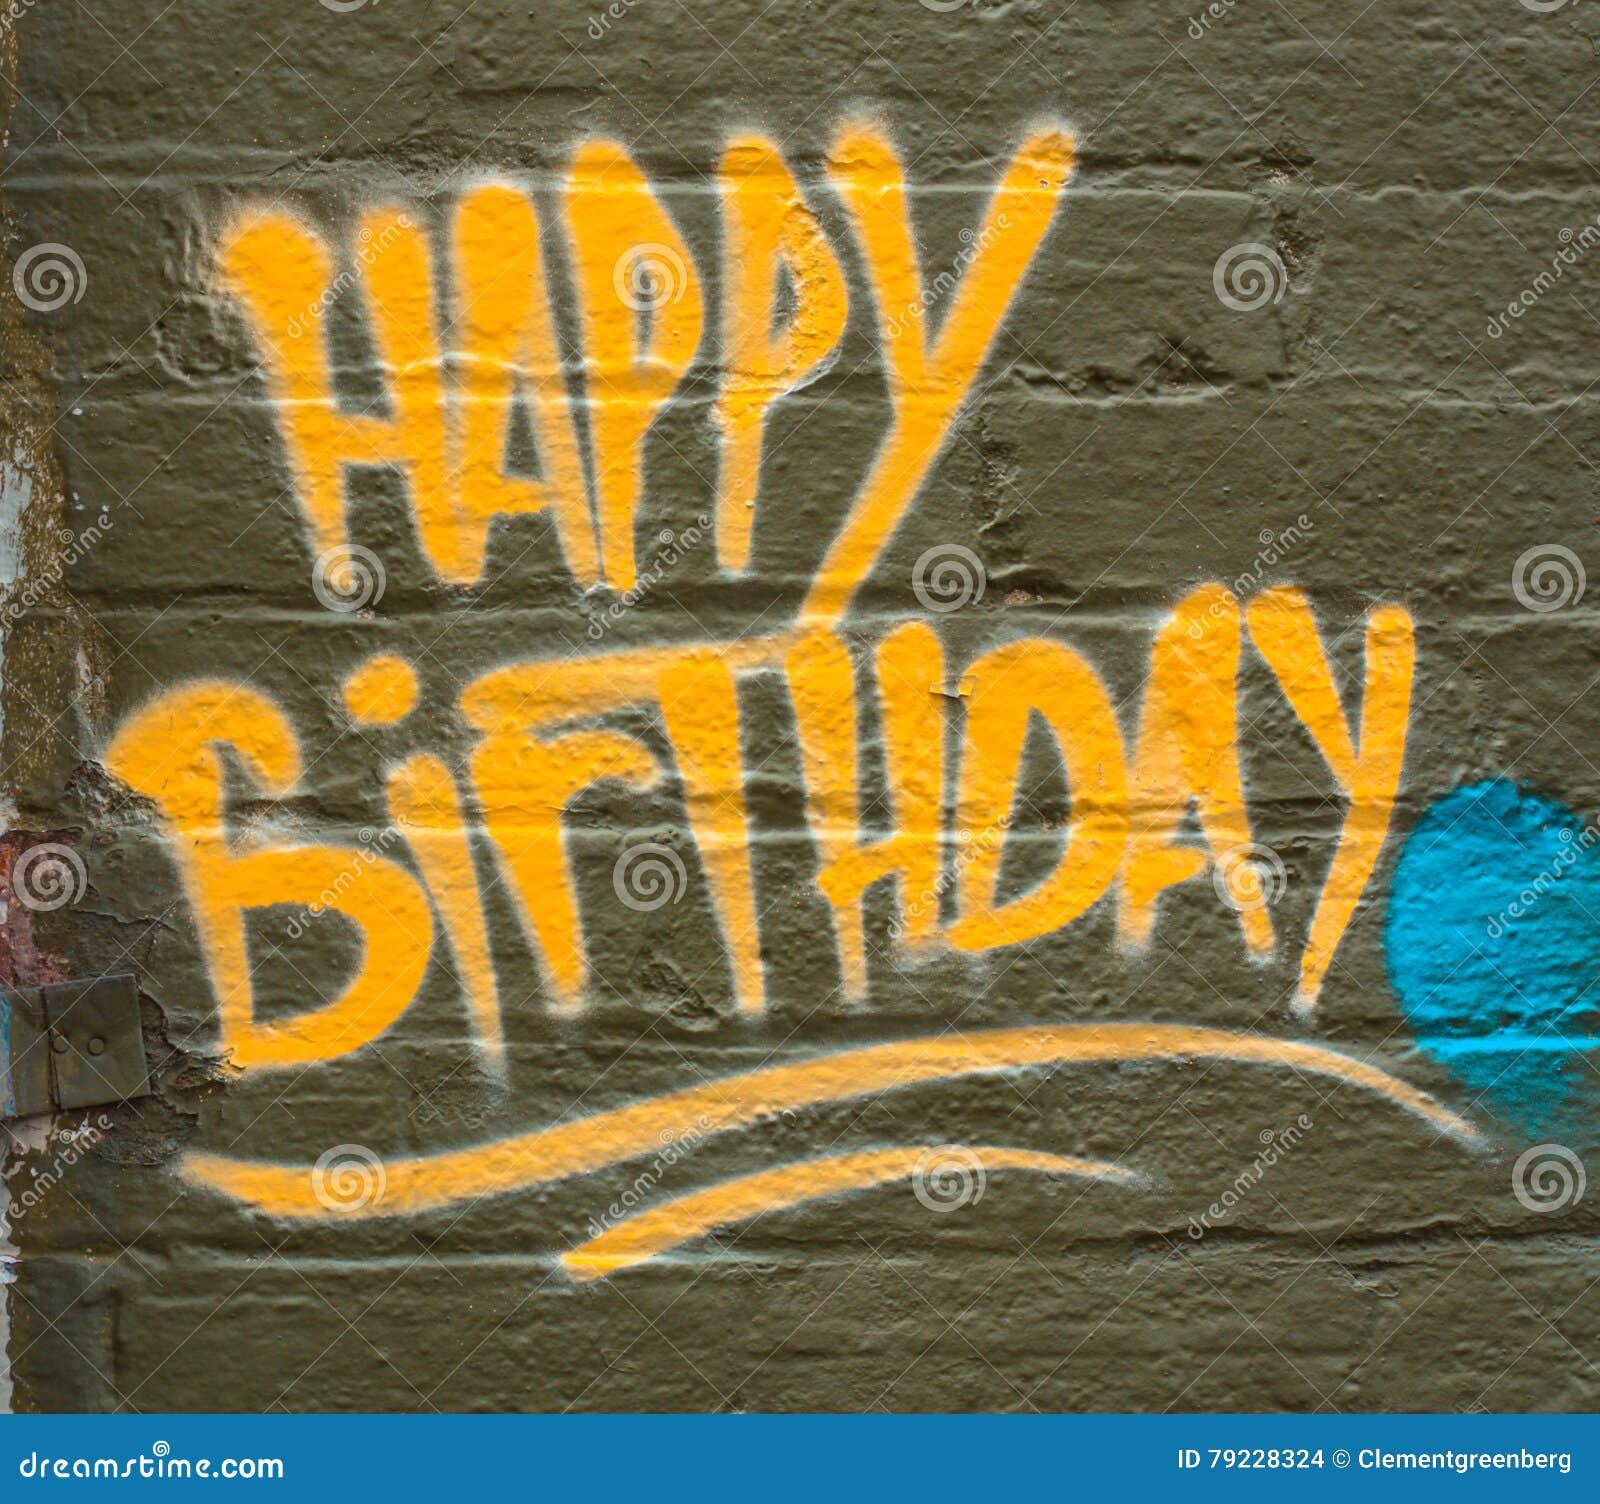 Happy Birthday Graffiti Stock Photos - Royalty Free Images